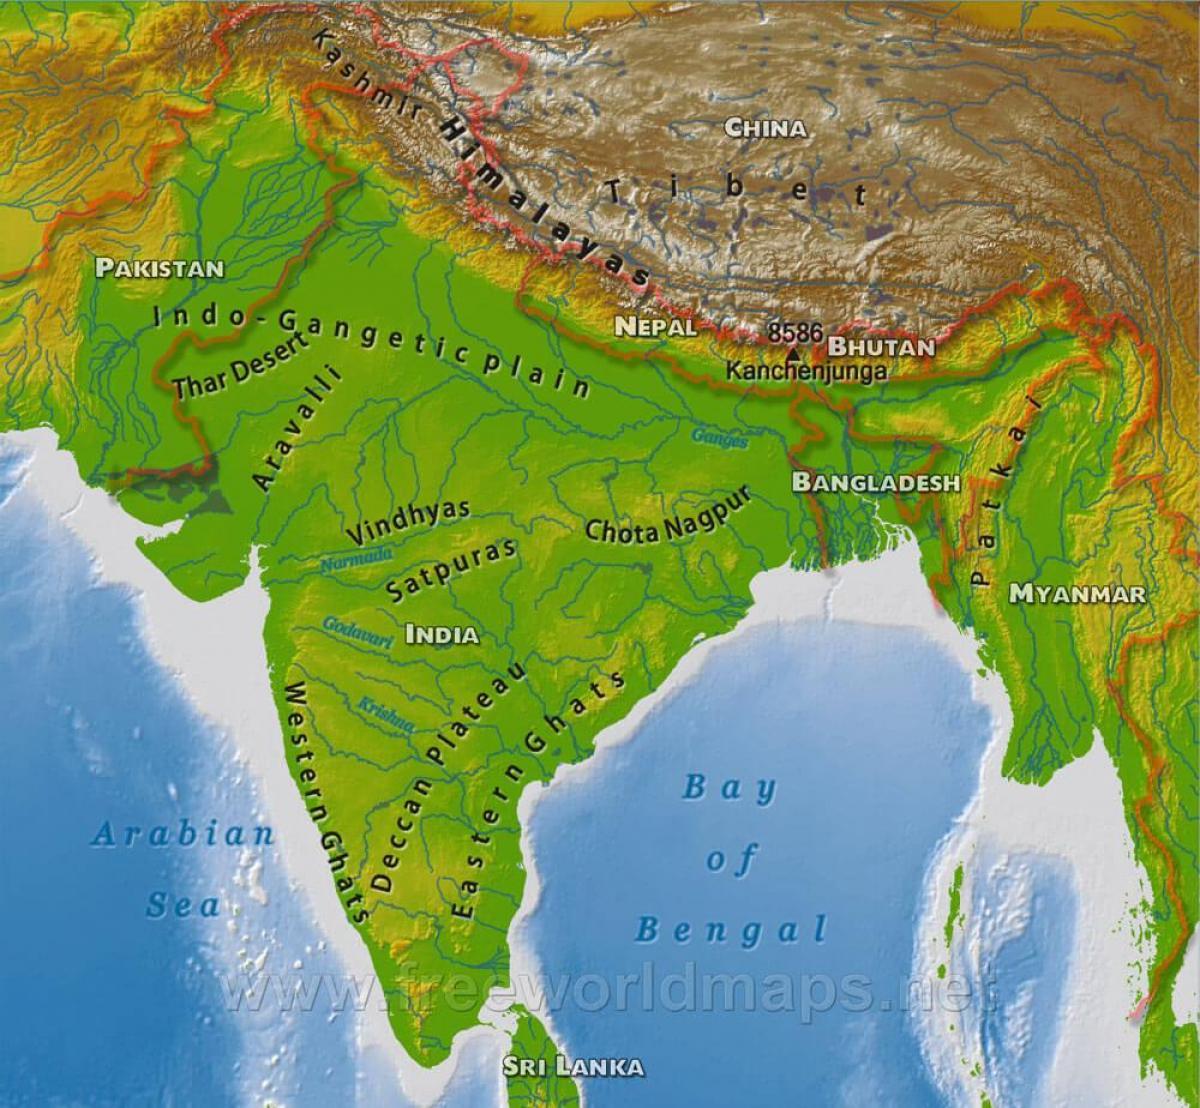 India Geografica Cartina.Mappa Di India Geografico India Mappa Geografica Sud Est Asiatico Asia